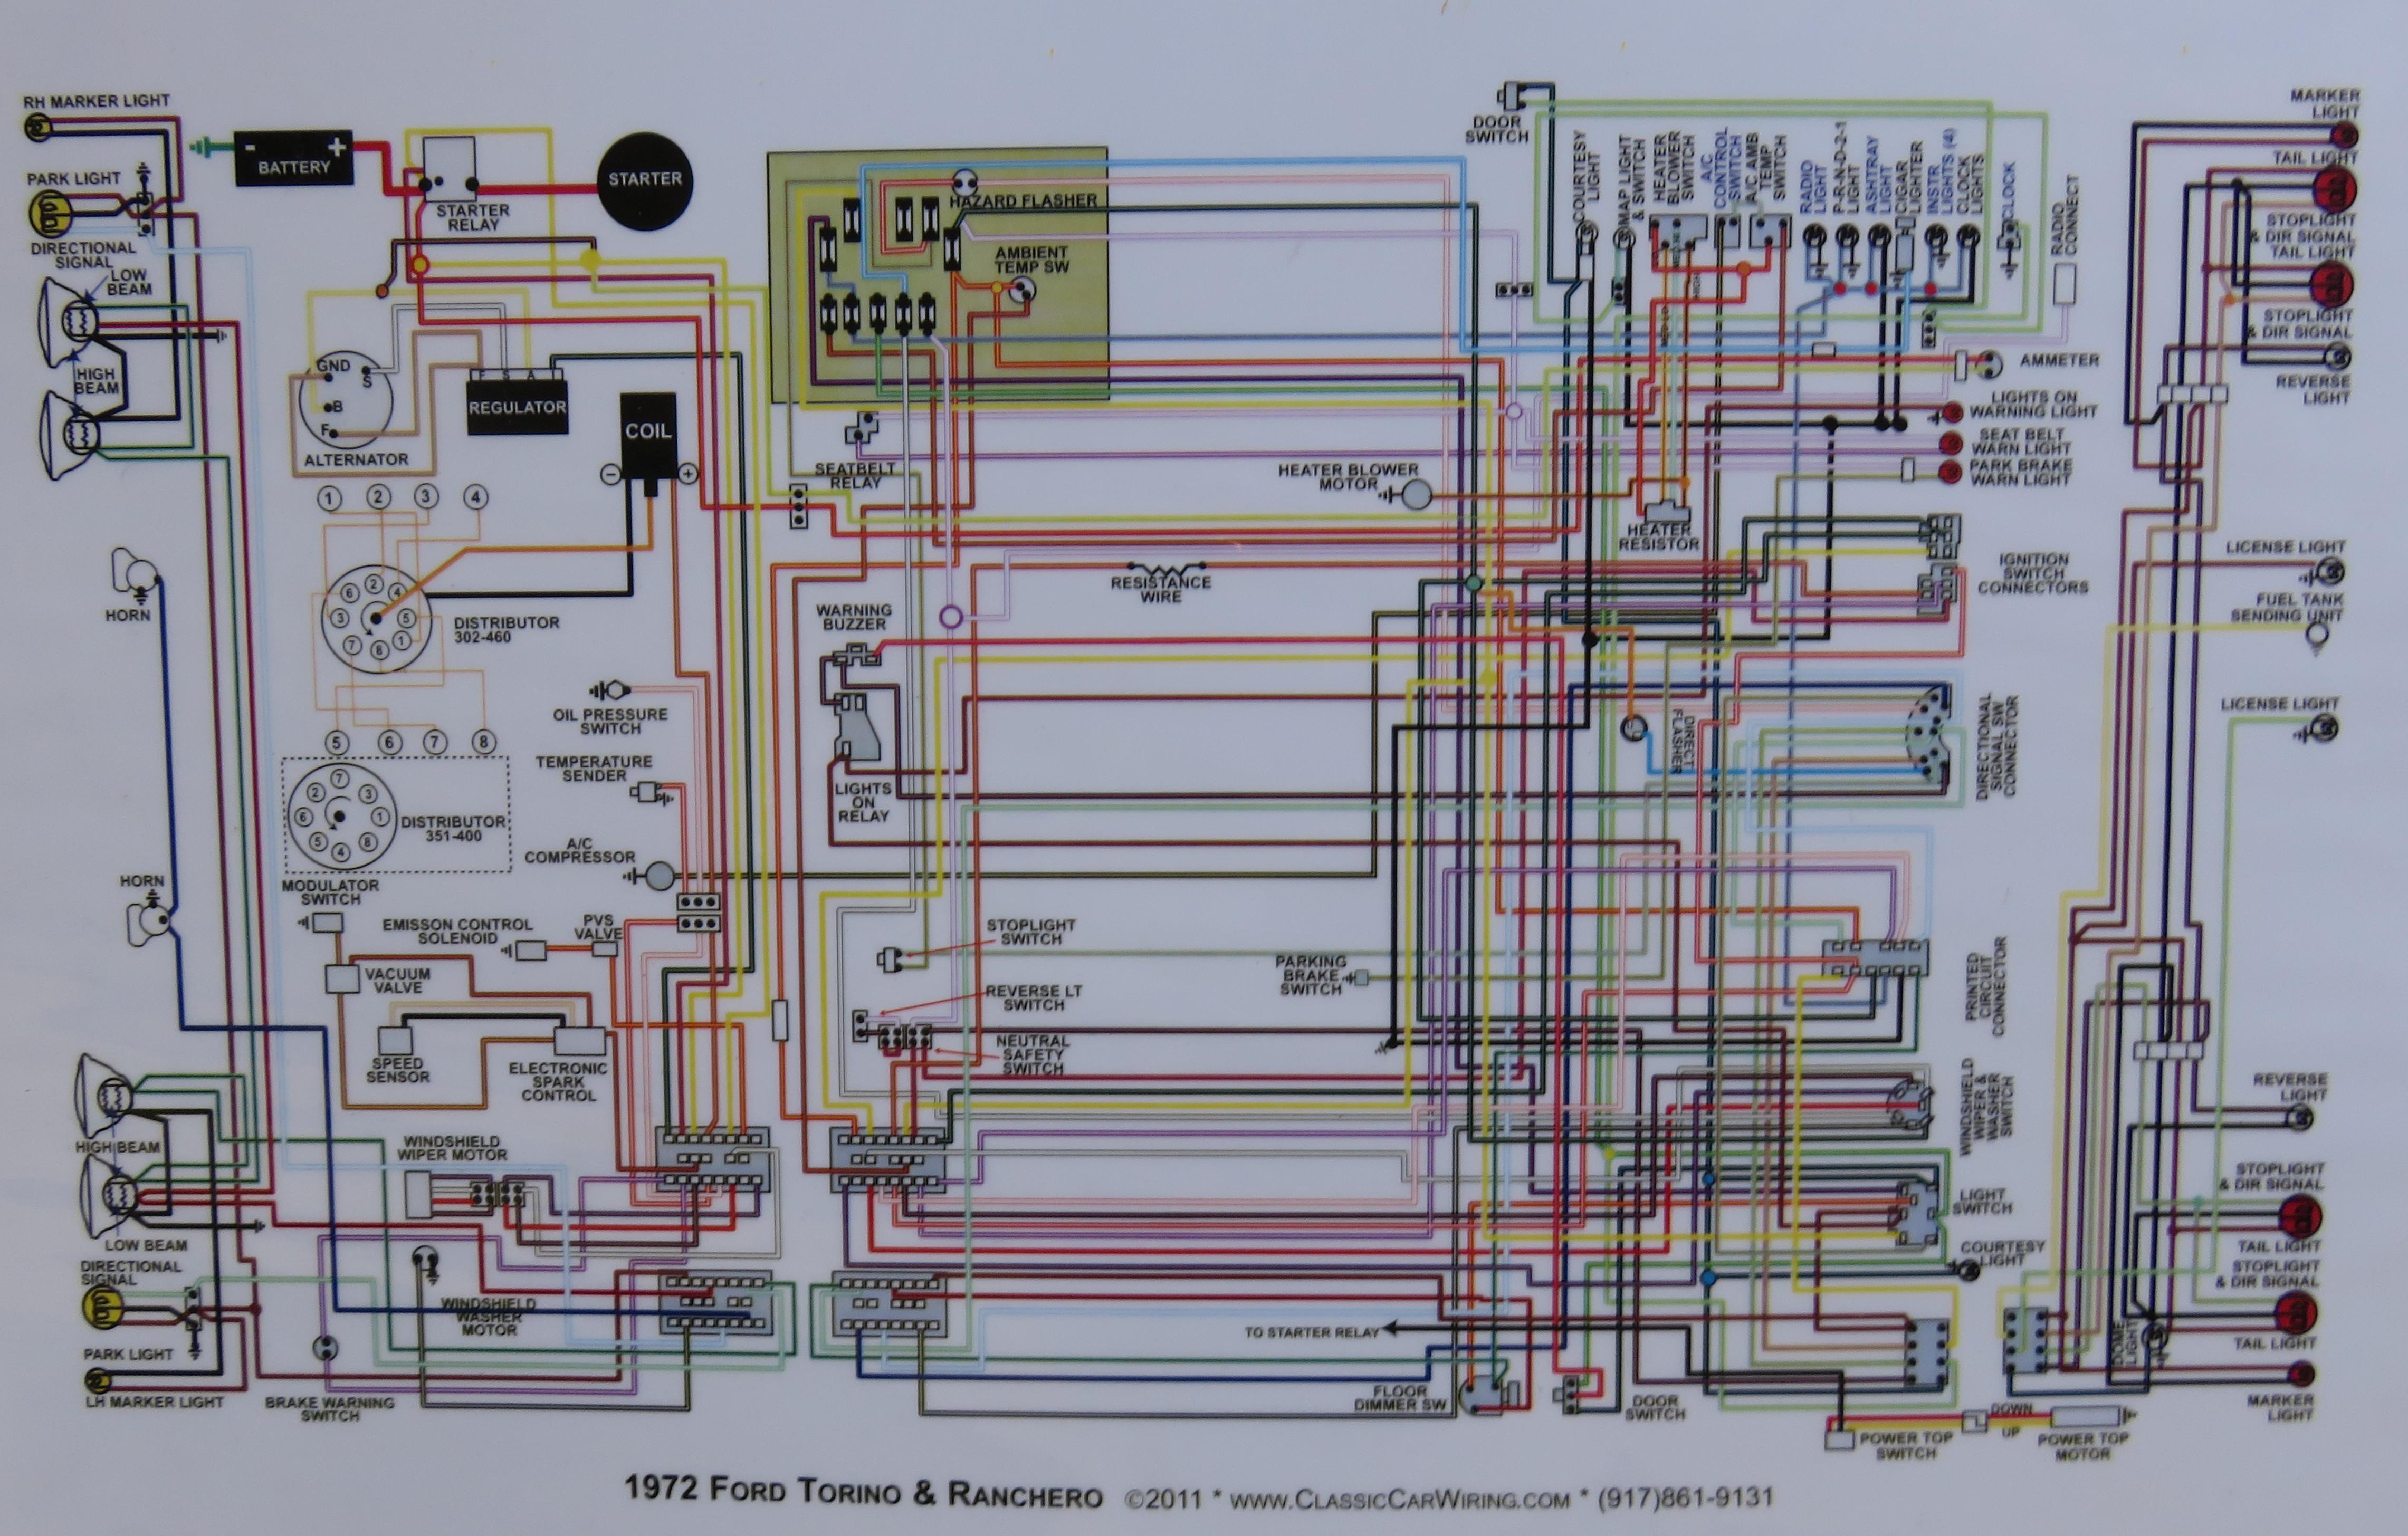 Portable Generator Wiring Diagram likewise Wiring Diagram Freeware in addition Onan Generator Wire Diagram as well P220 Onan Engine Parts Manual in addition Genset Wiring Diagram. on old onan generators wiring diagrams